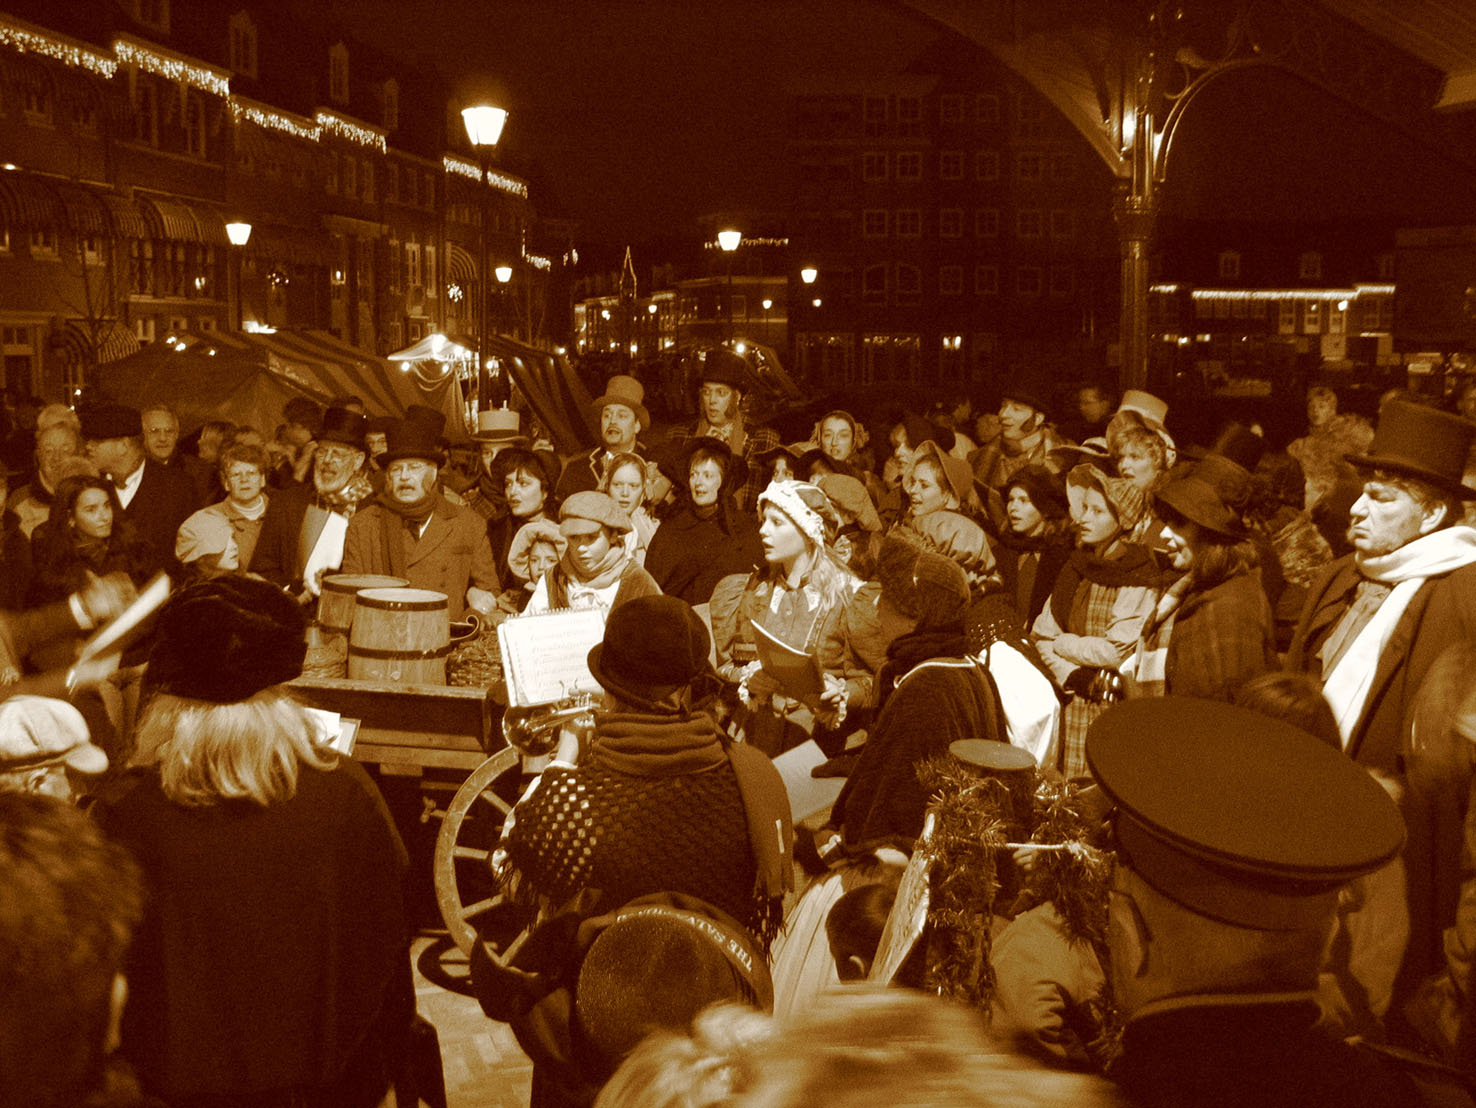 067 - Kerstmarkt Helmond 2003.jpg